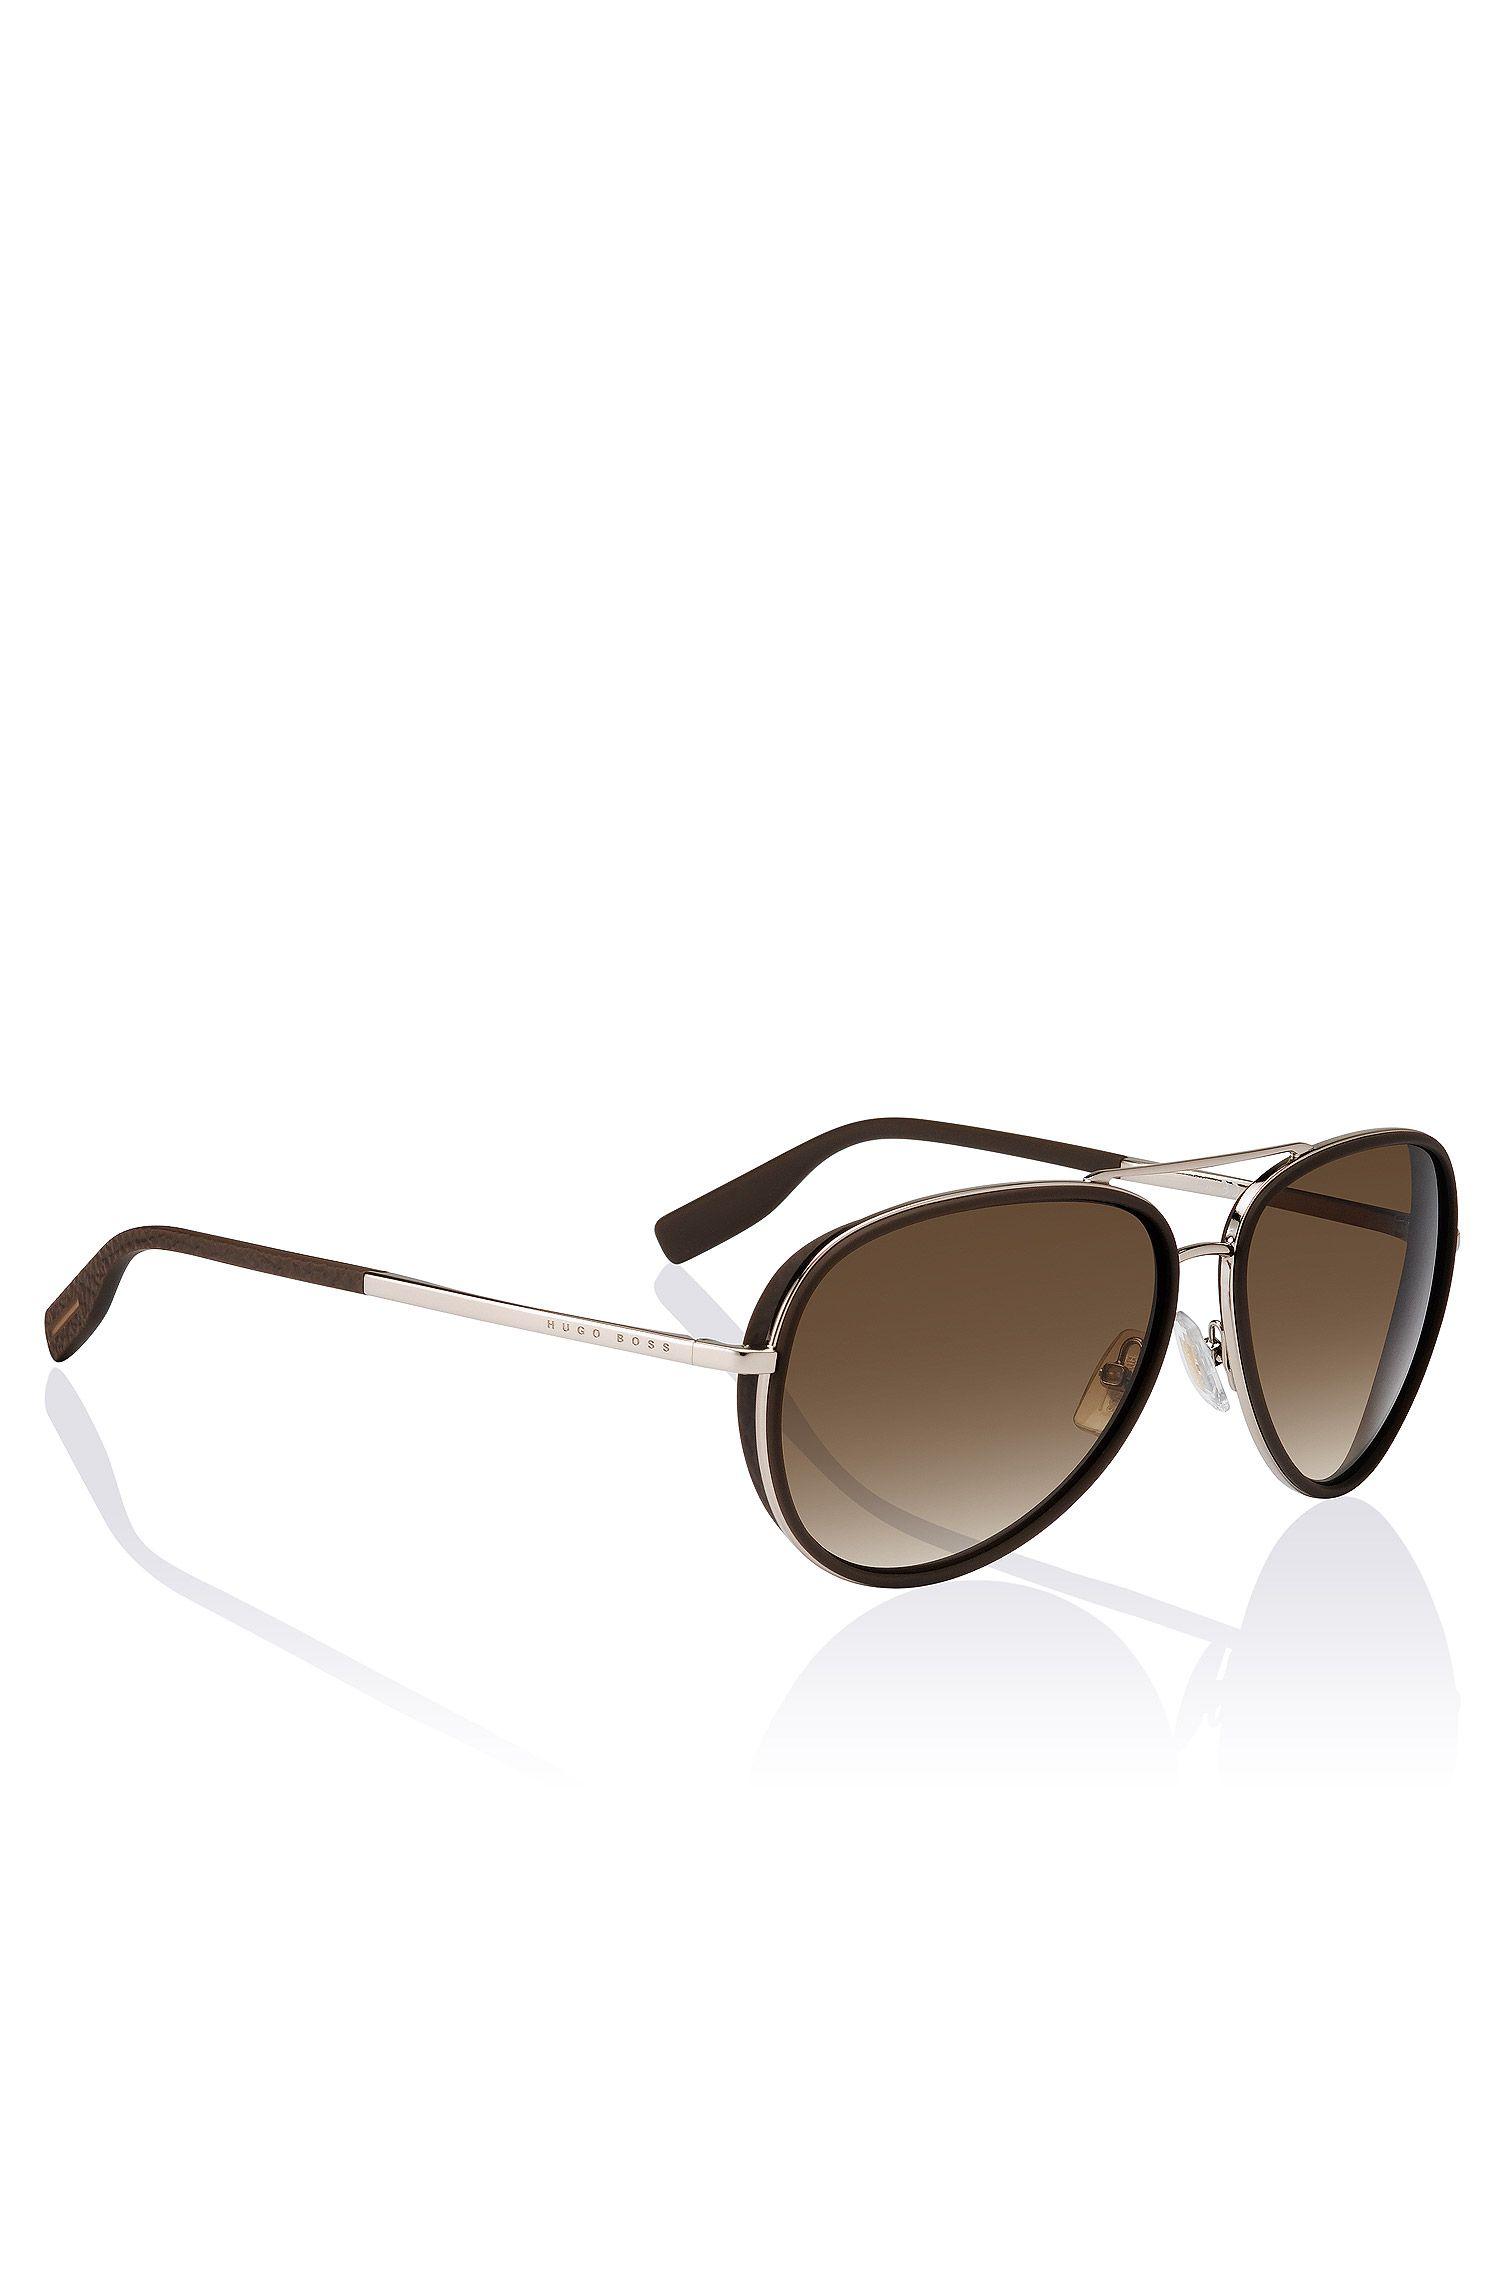 Gafas de sol de estilo aviador 'BOSS 0510/S'